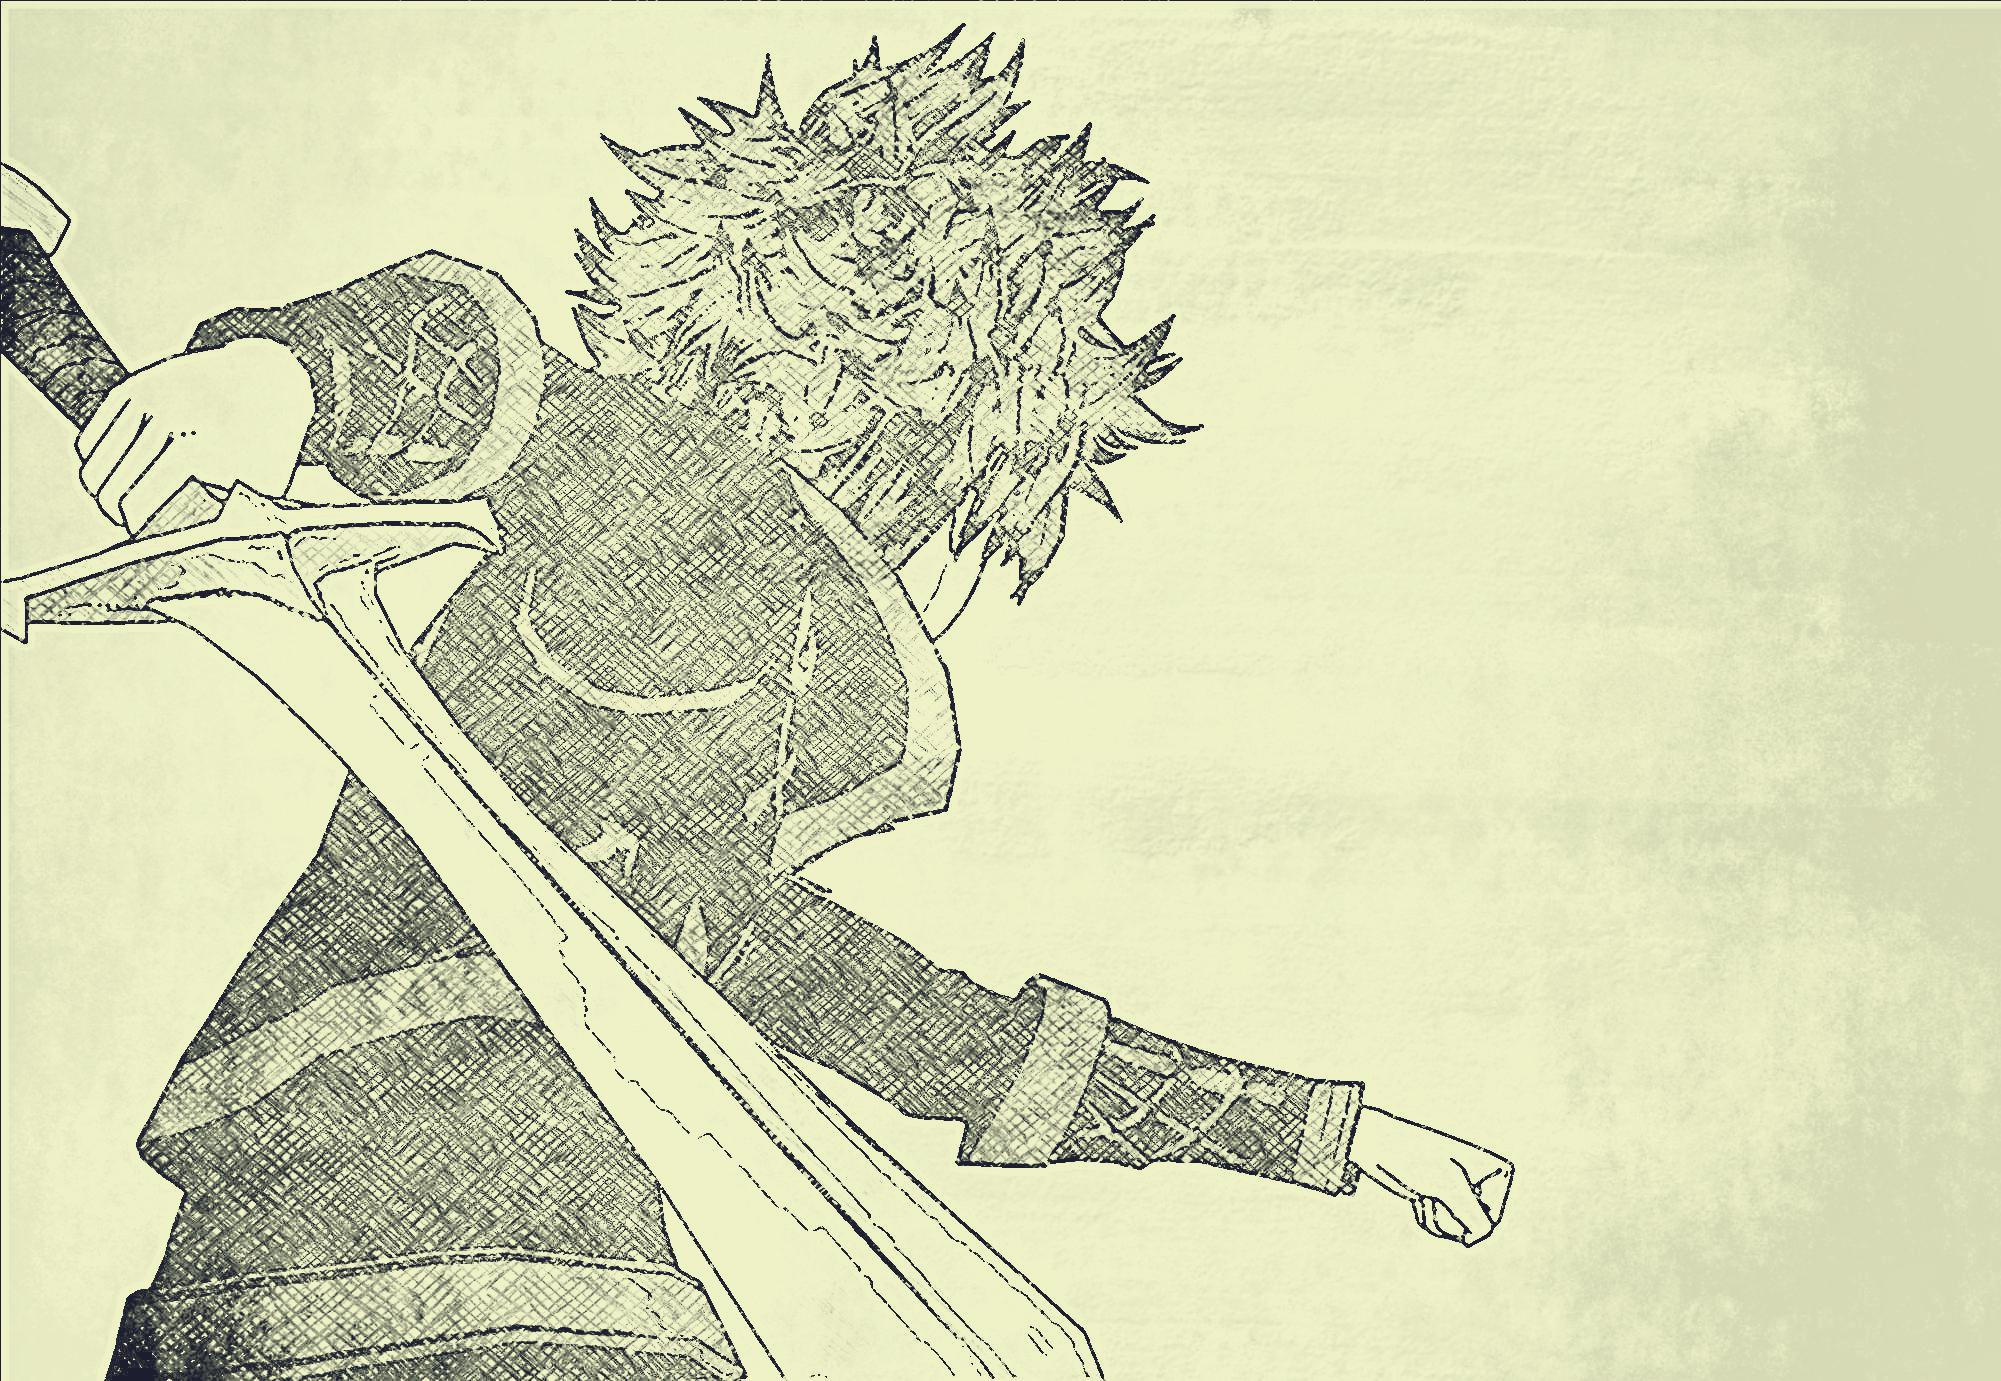 Showdown Sketch